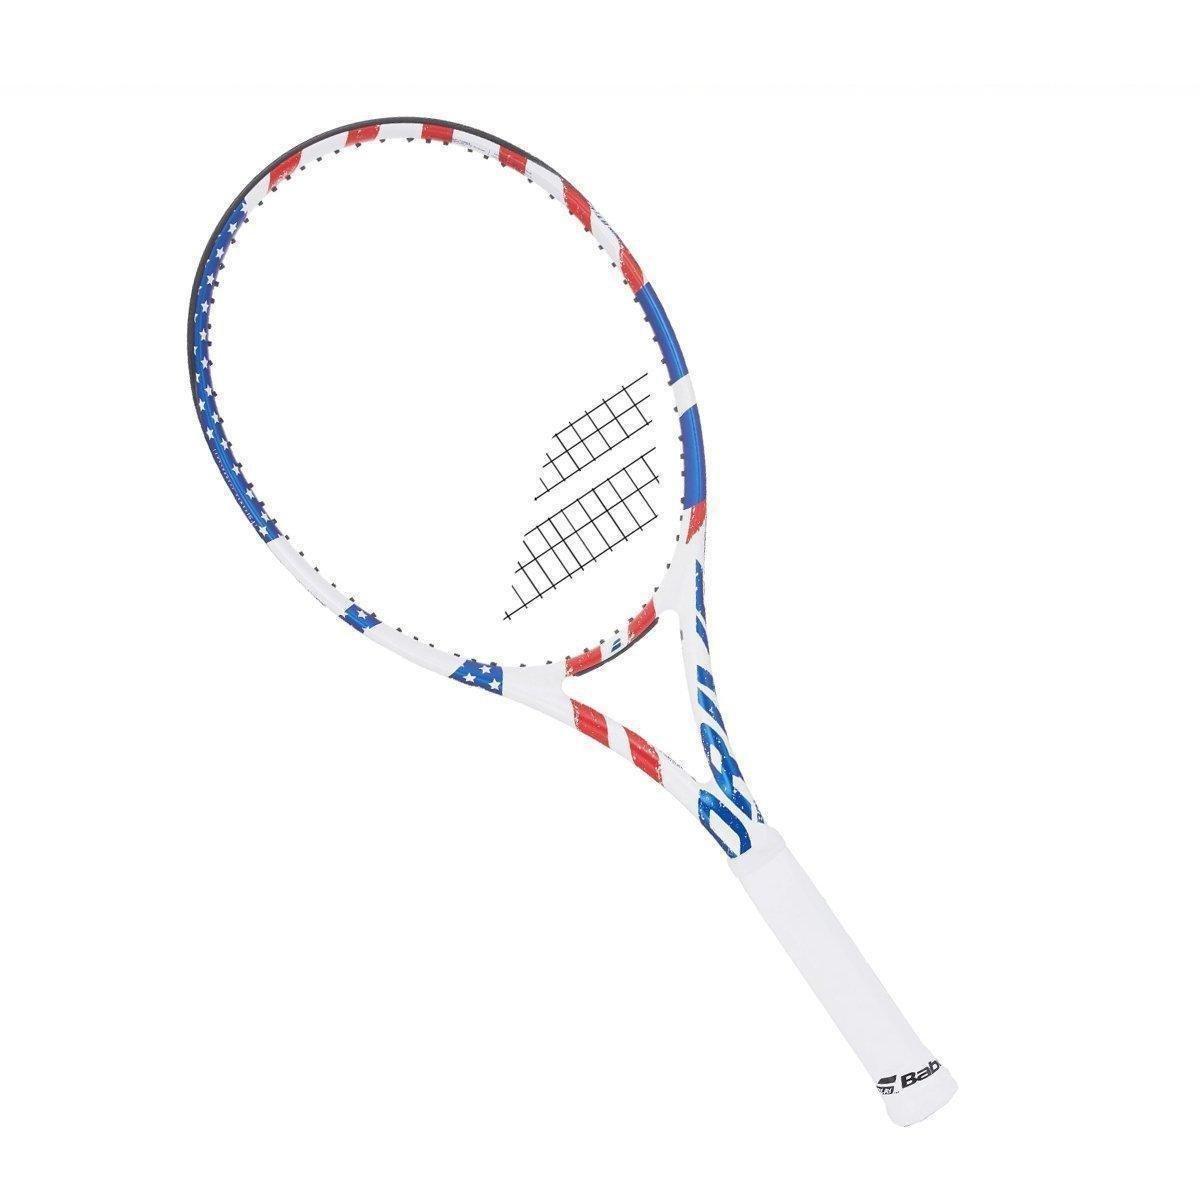 Raquete de Tênis Babolat Pure Drive USA Country L2